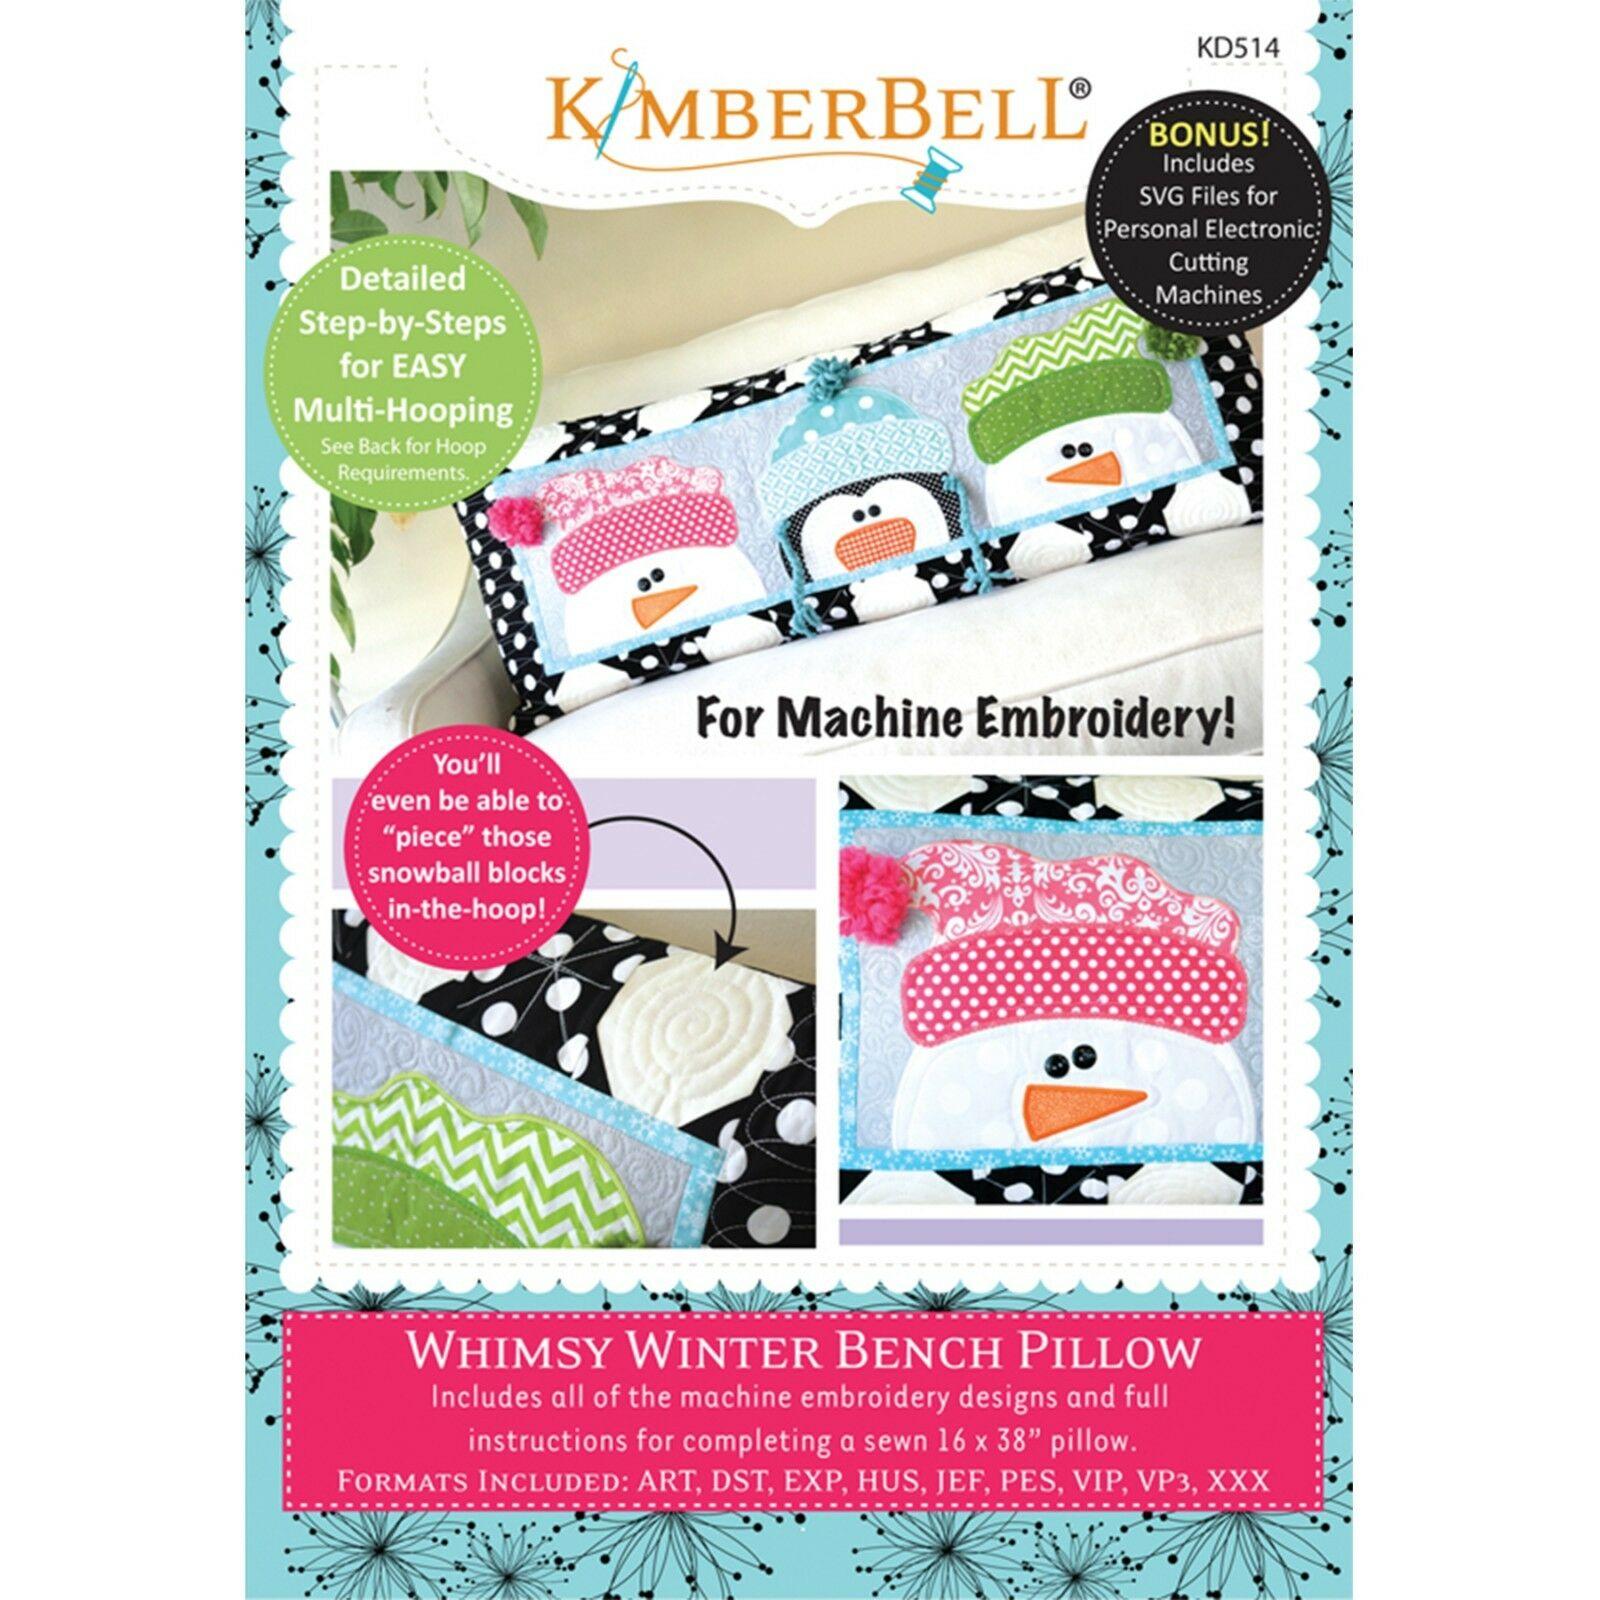 KIMBERBELLWHIMSY WINTER BENCH PILLOW (JAN) – MACHINE EMBROIDERY CD